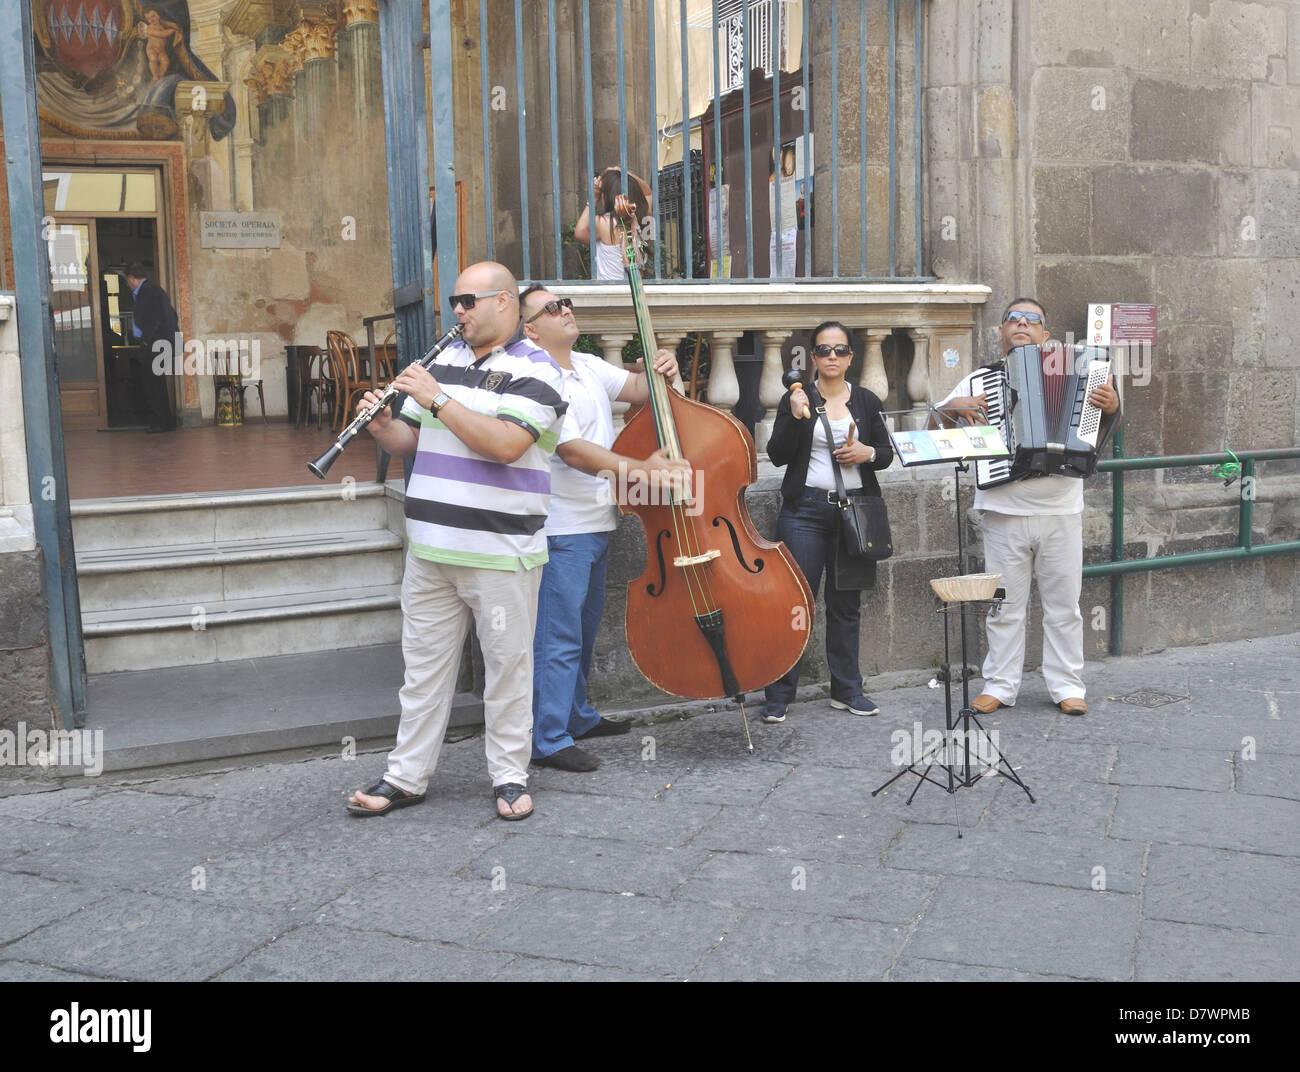 Street musicians in Sorrento, Italy. Stock Photo